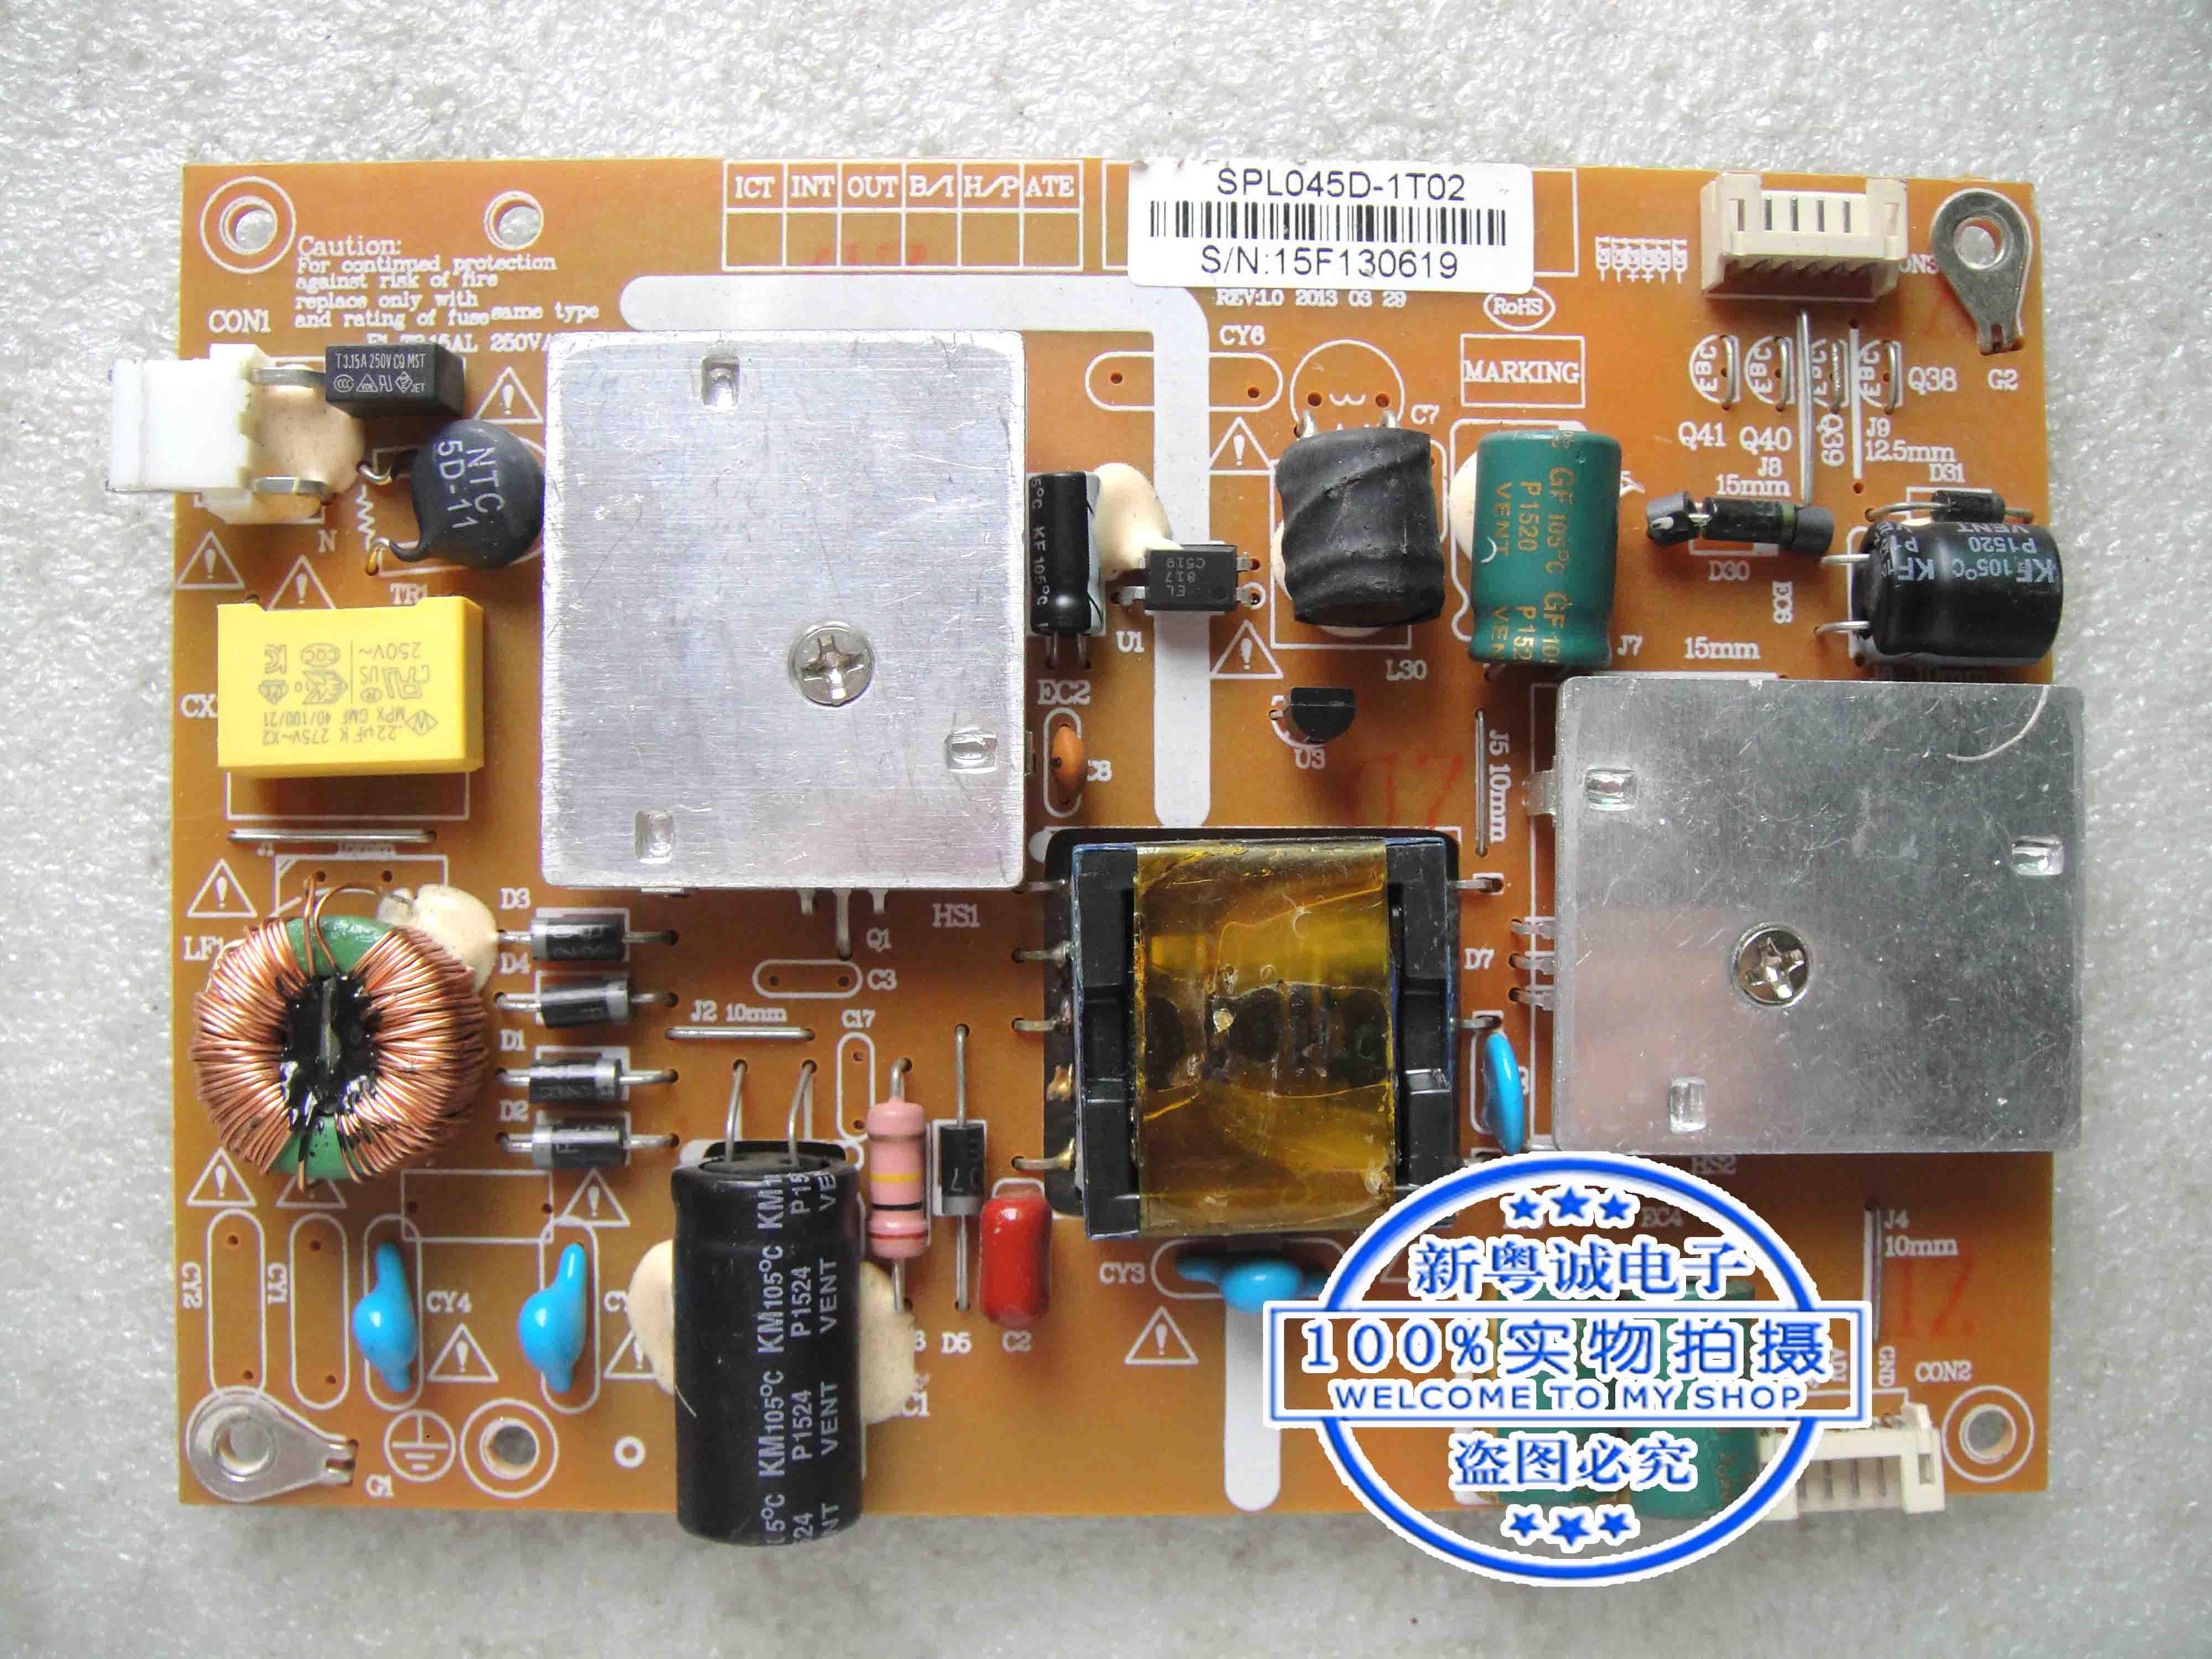 SPL045D-1T02 15F130619 SPLO45D-1T02 امدادات الطاقة مجلس